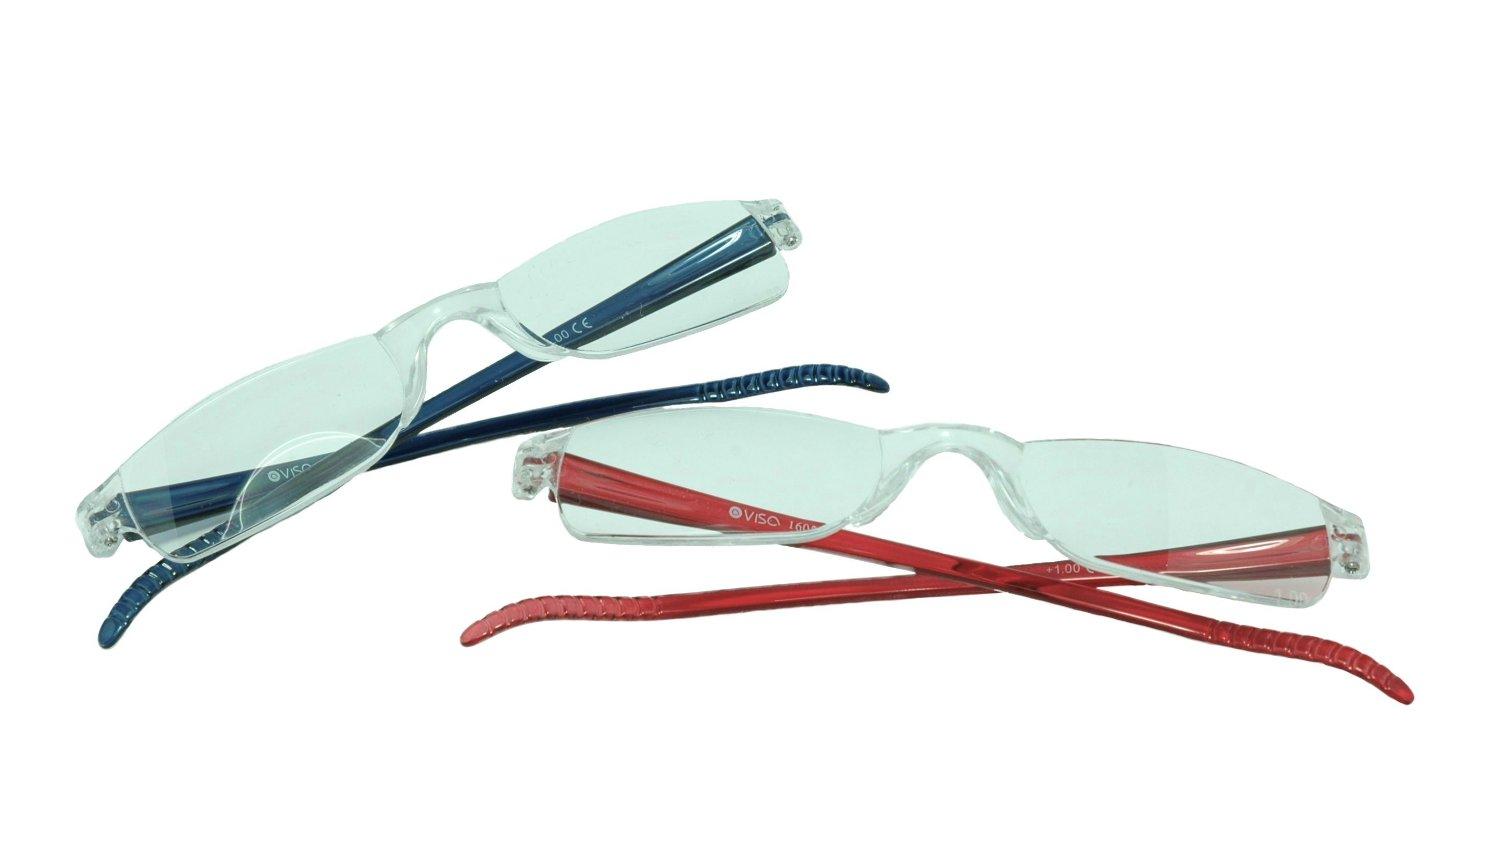 Image of Visa Reading Glasses (#111605) Red & Blue, 2-pack